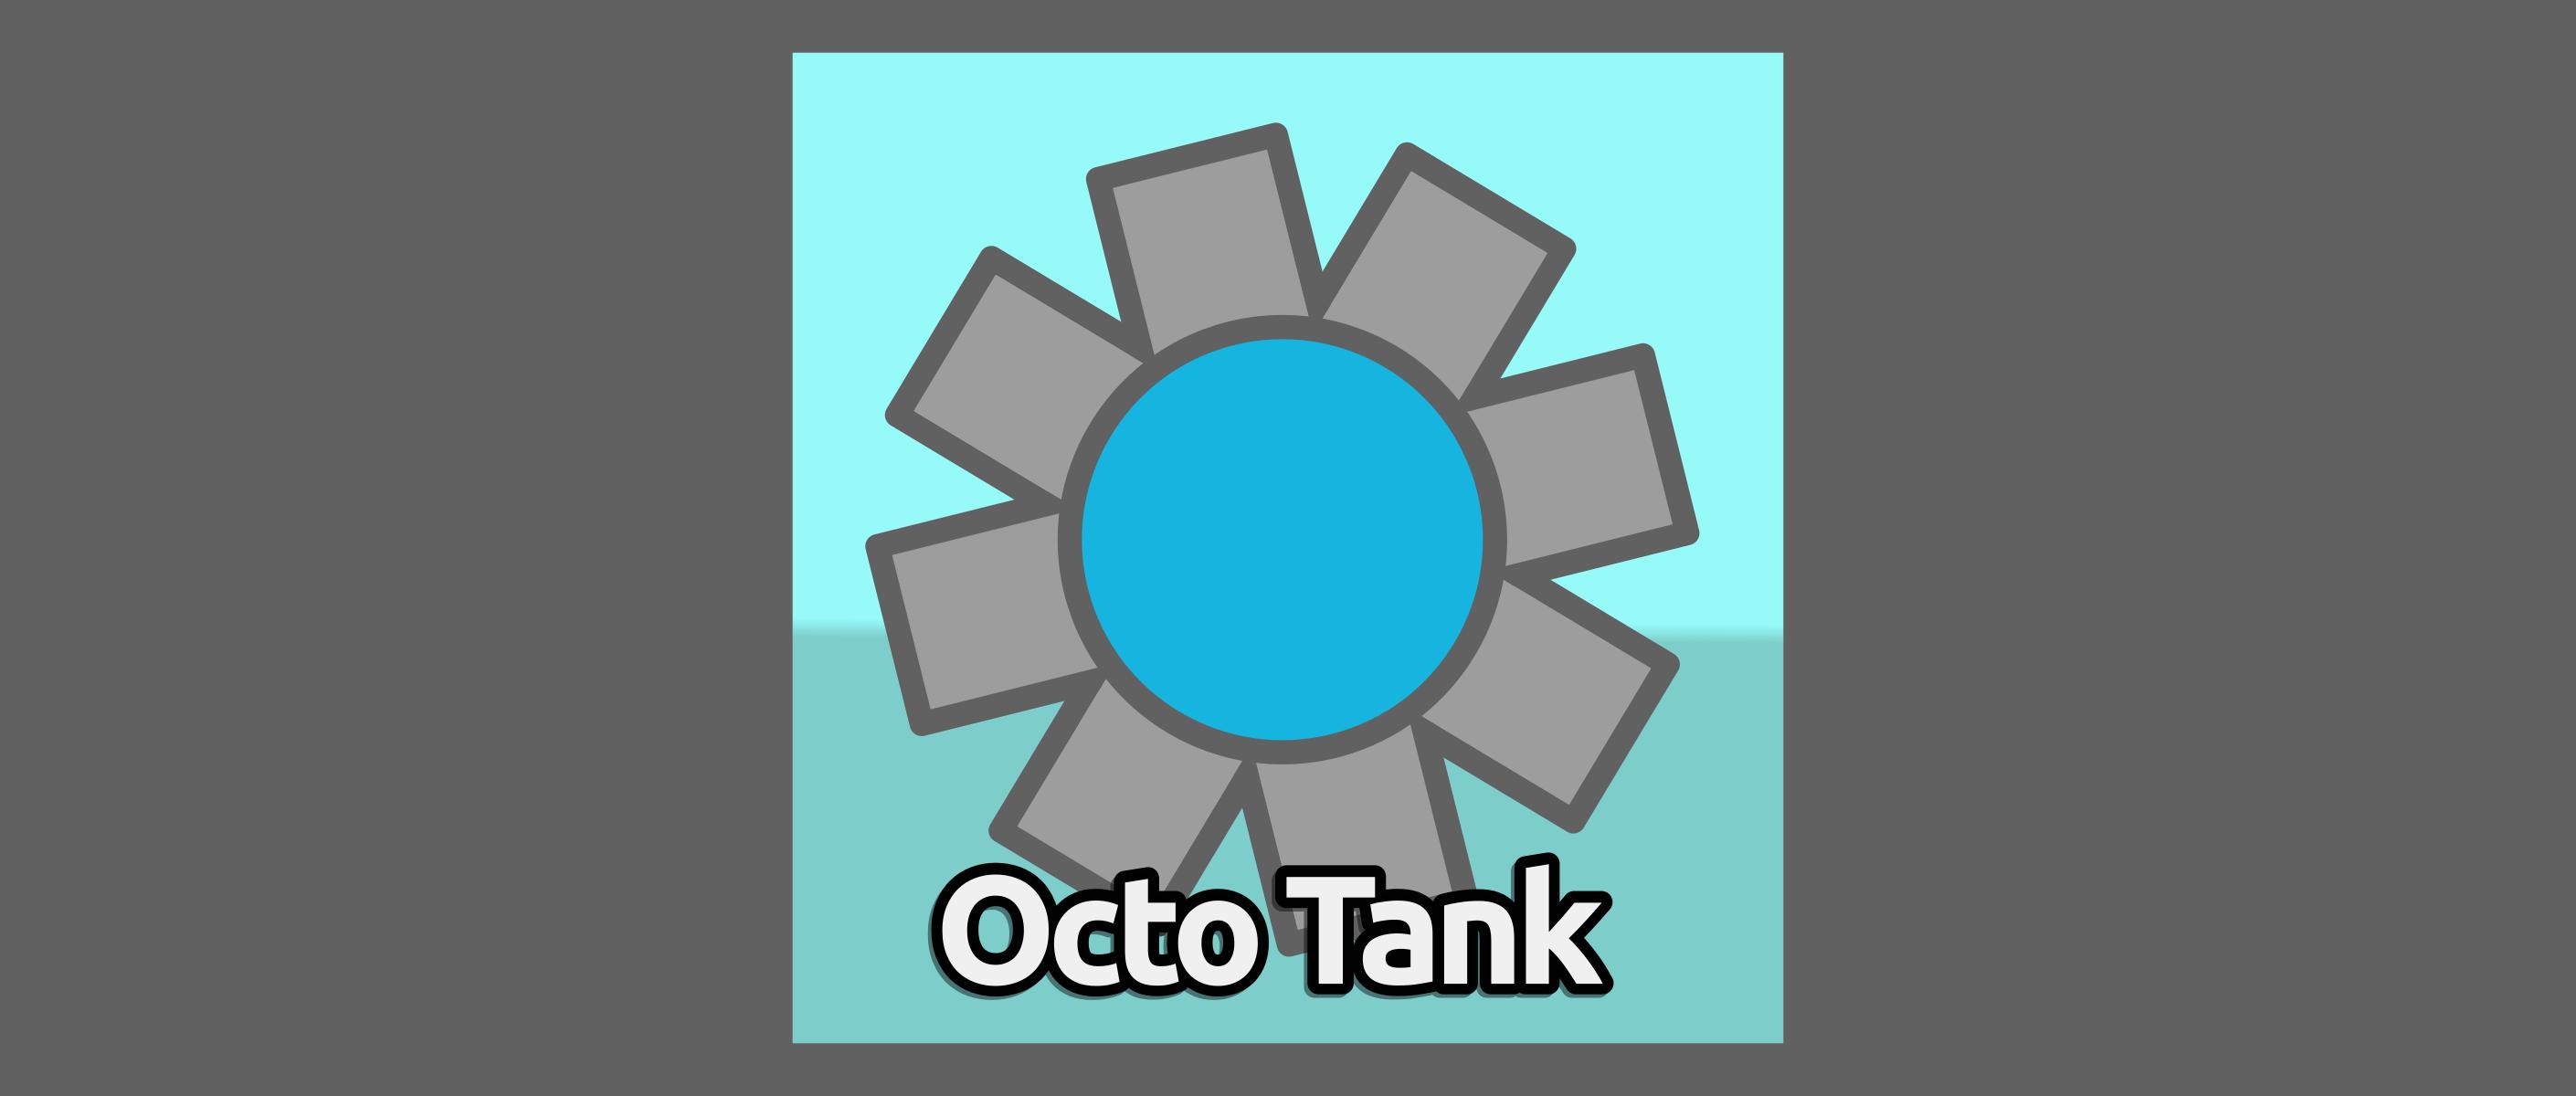 Octo Tank